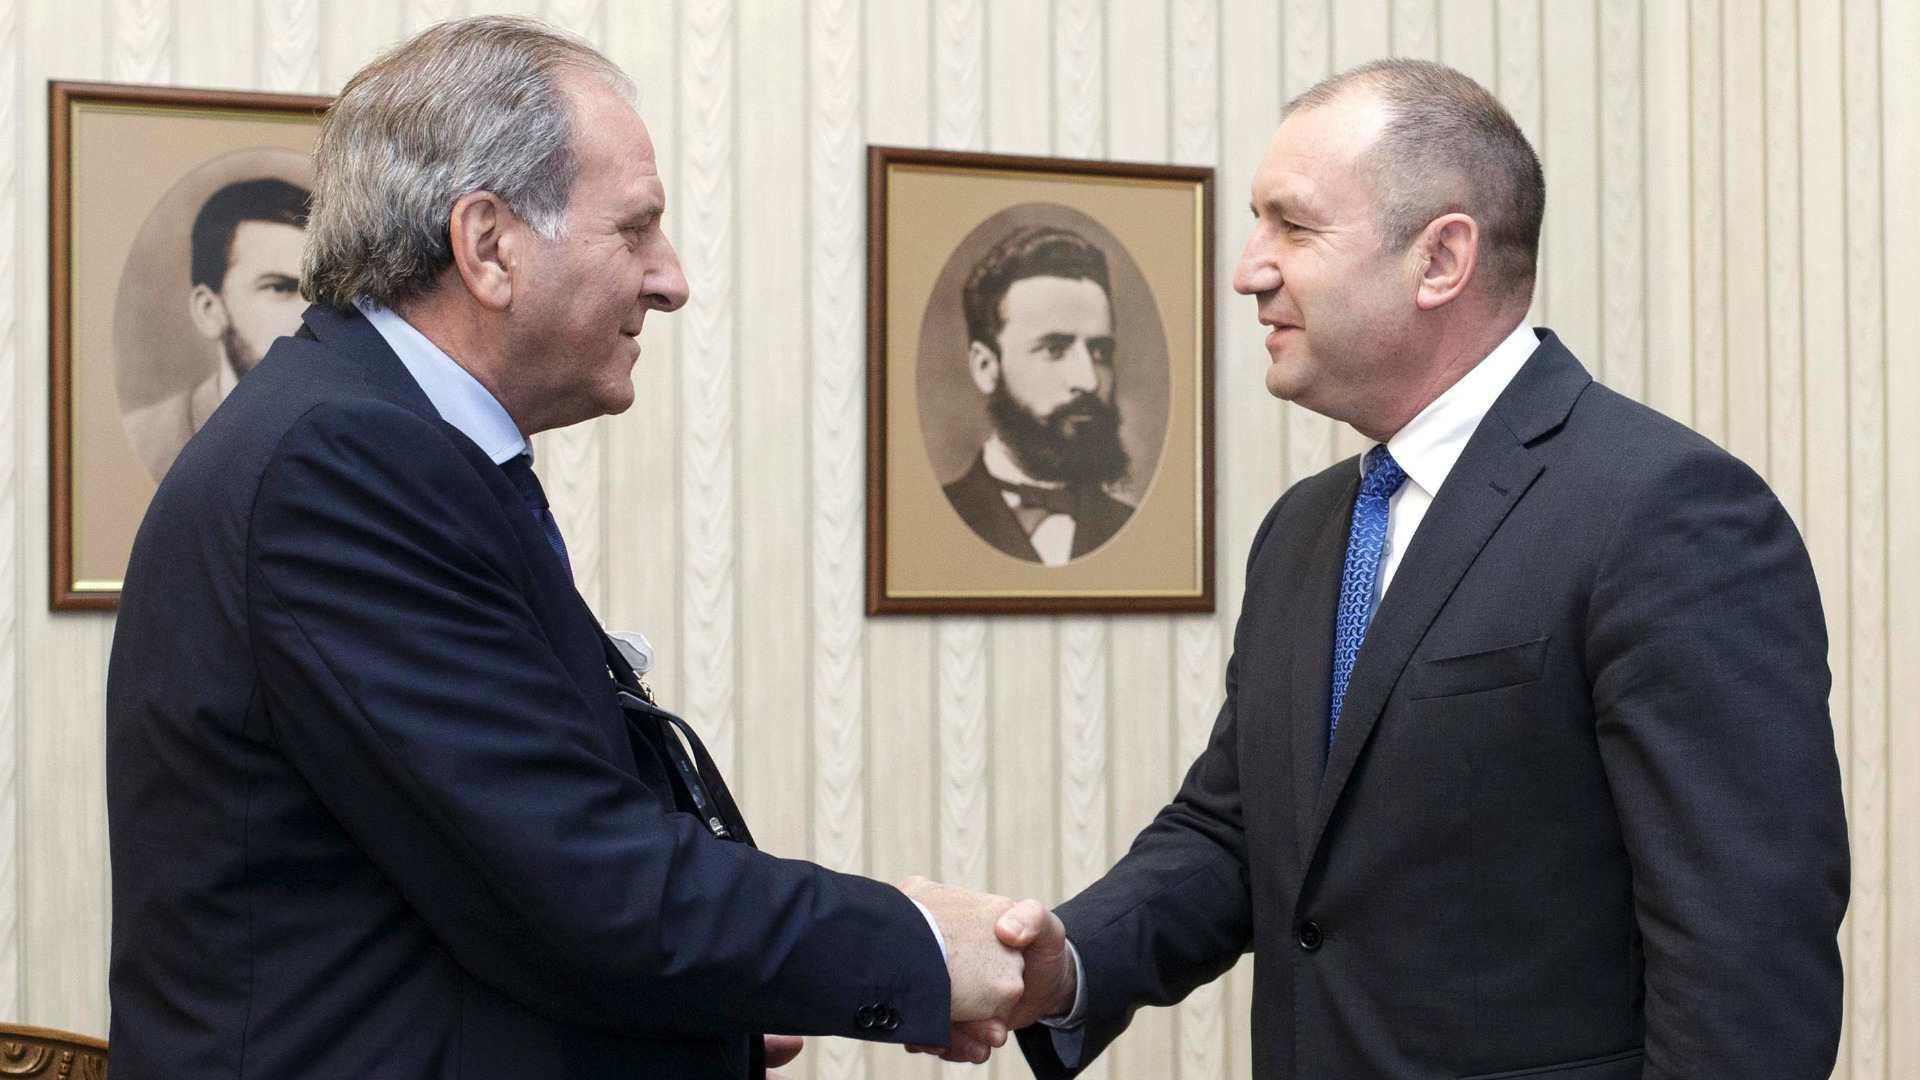 Президентът Румен Радев разговаря с проф. Джузепе Консоло, адвокат на Сергей Антонов